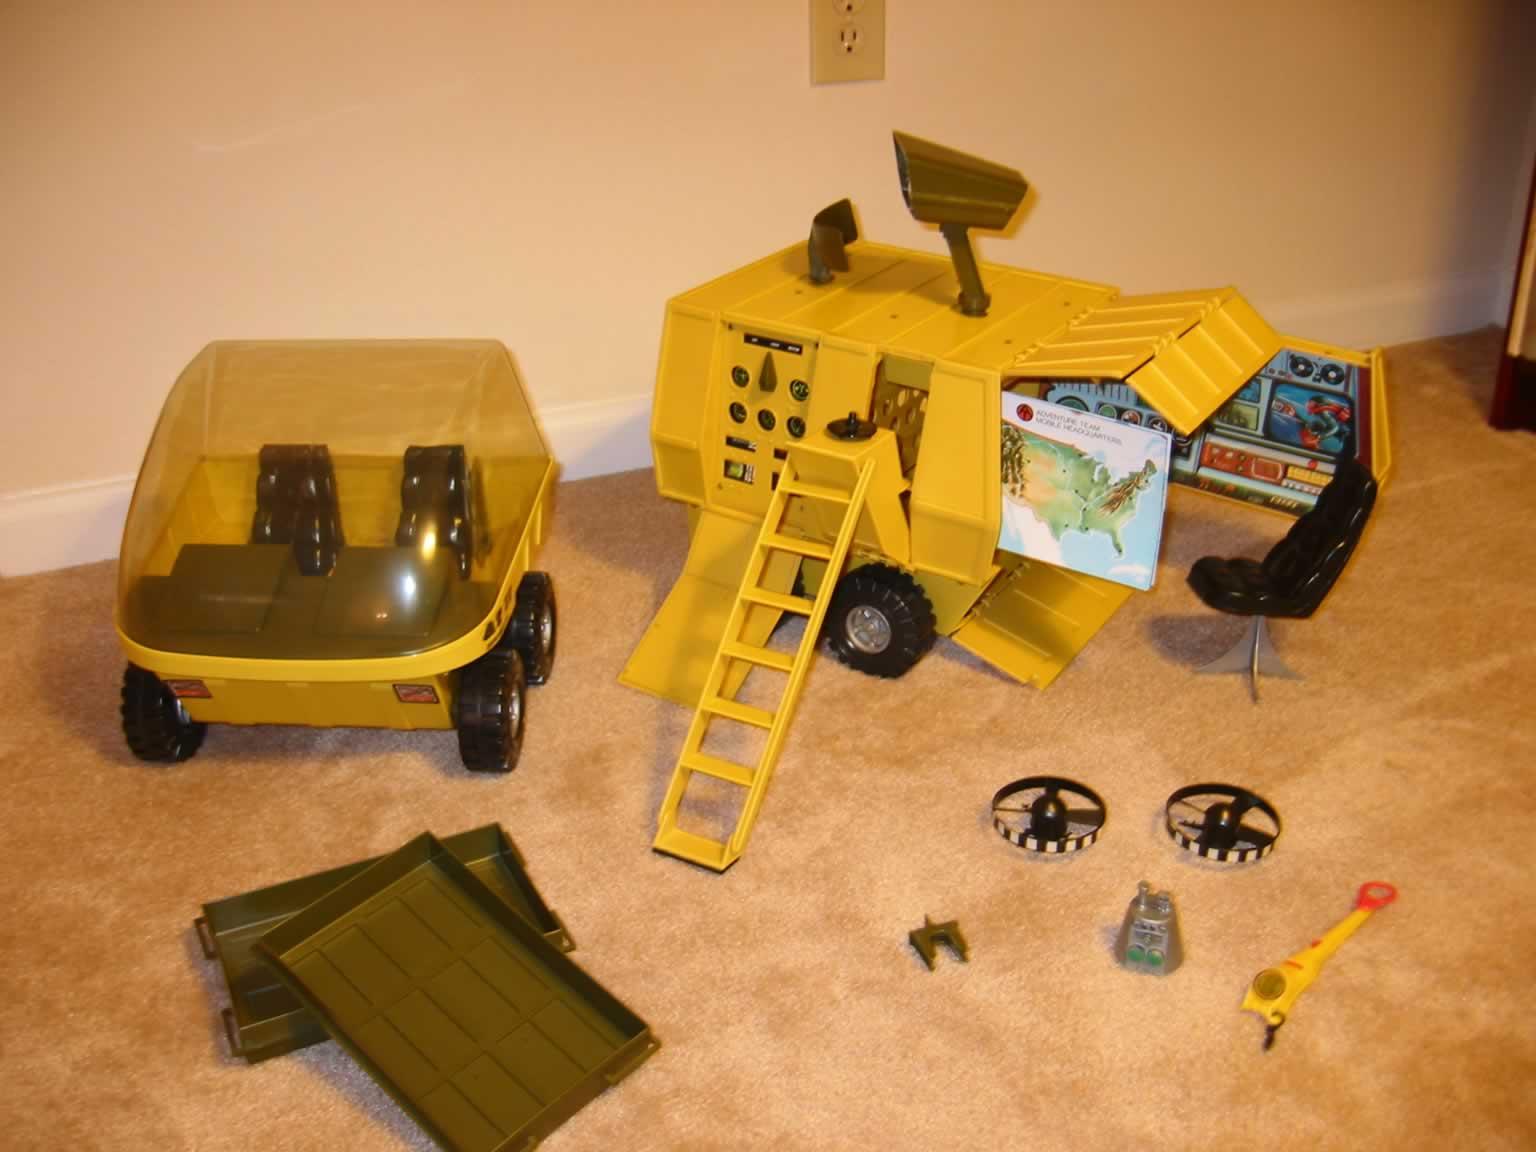 GI Joe Vehicles For Sale or Trade @ BuyOldToys.com - We sell old ...